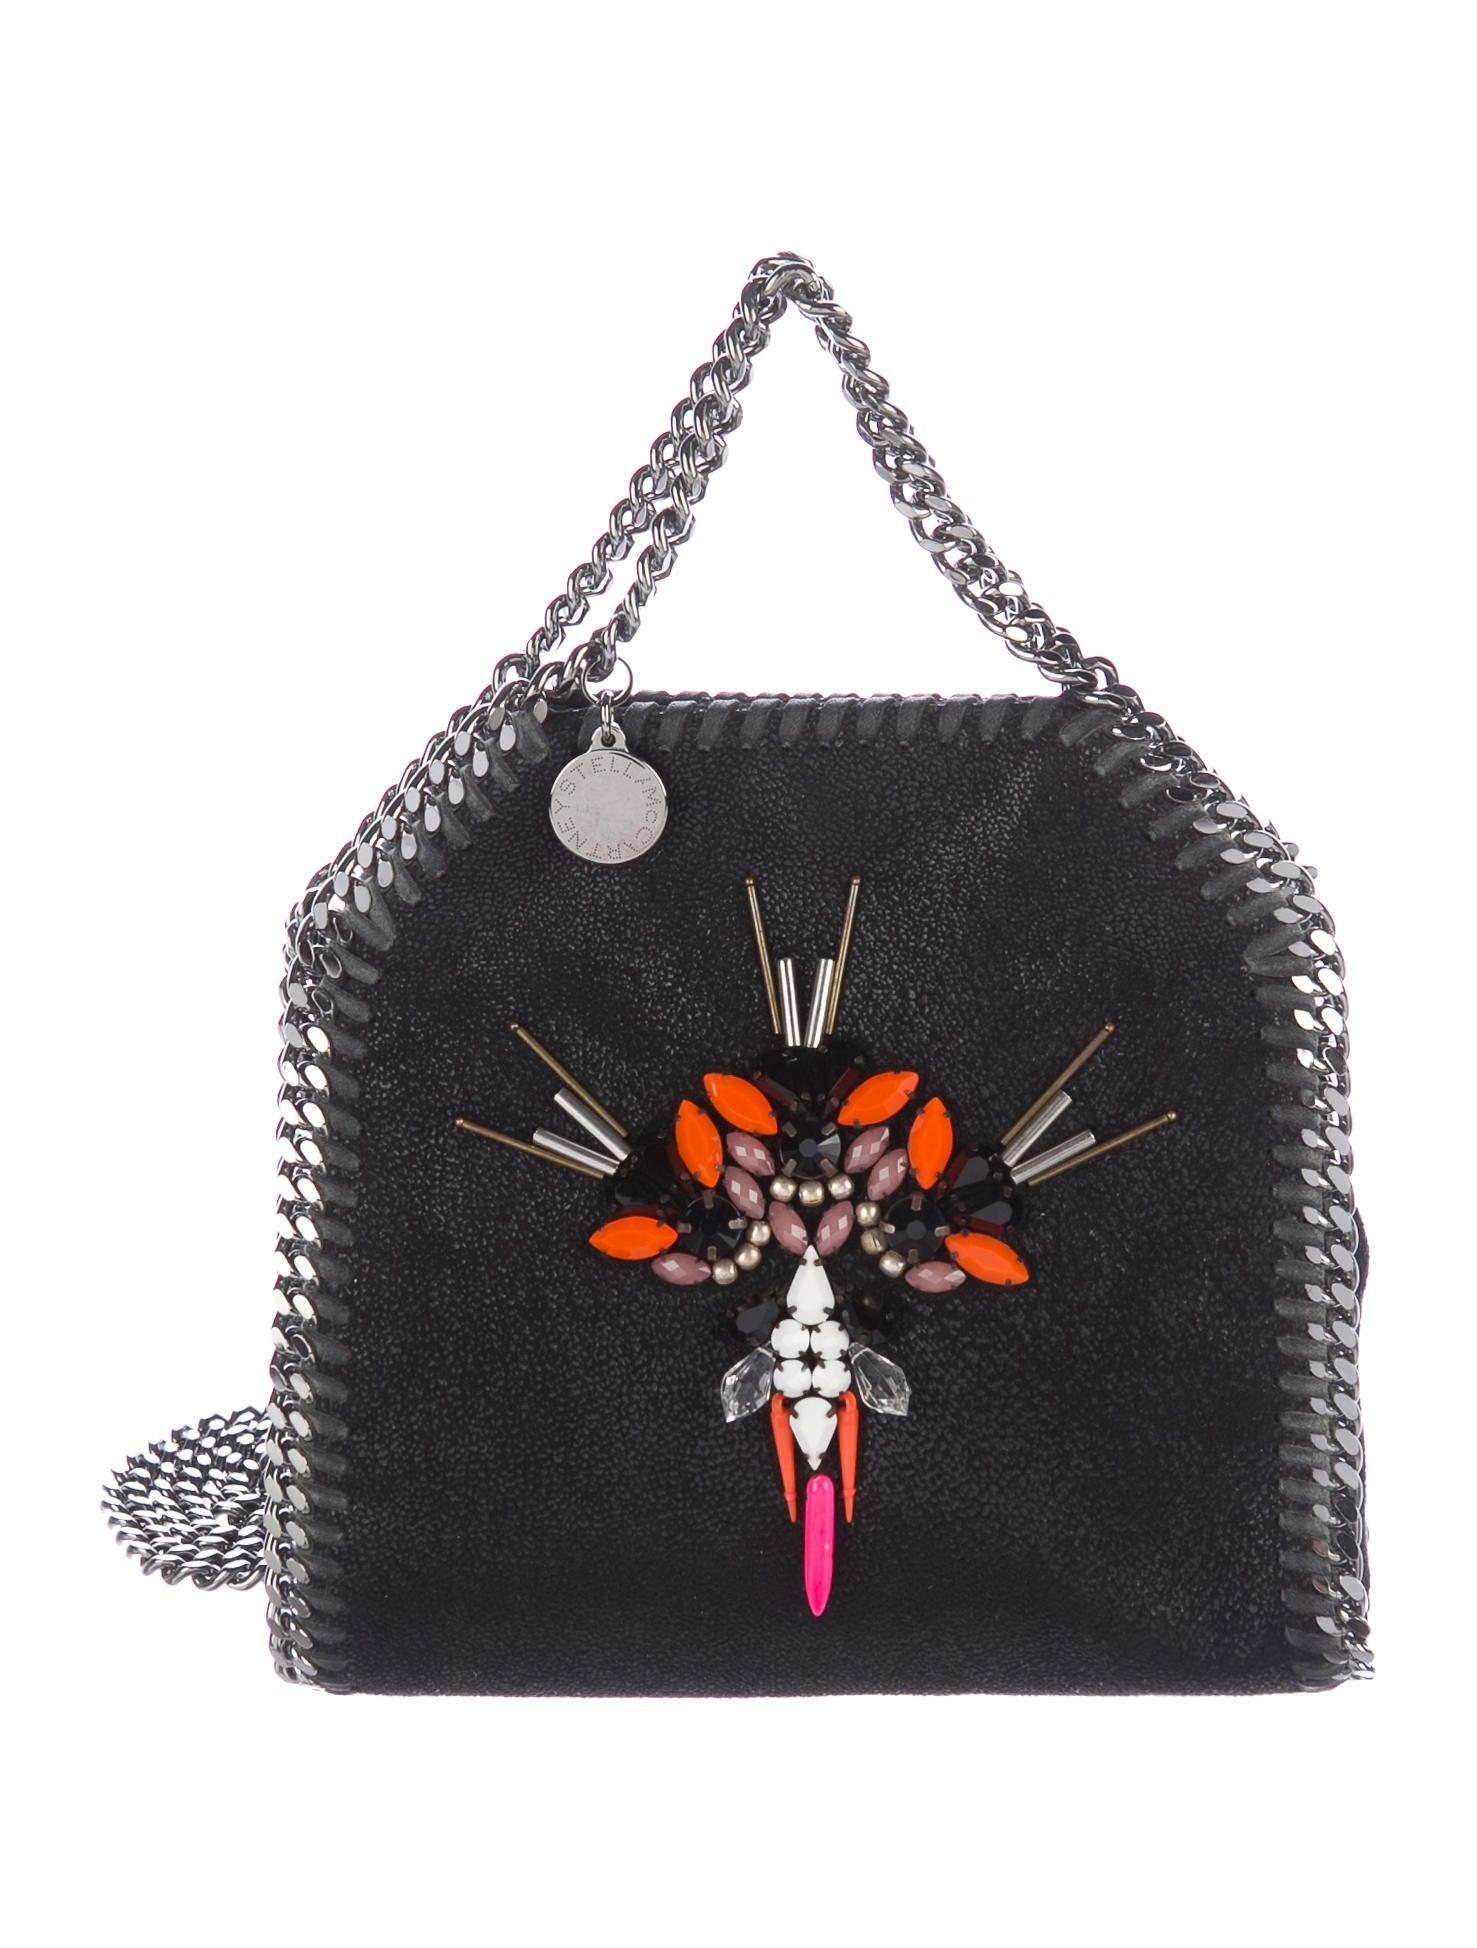 0ea00043d385 Stella McCartney Stella McCartney Embellished Shaggy Deer Falabella Mini  Crossbody Bag